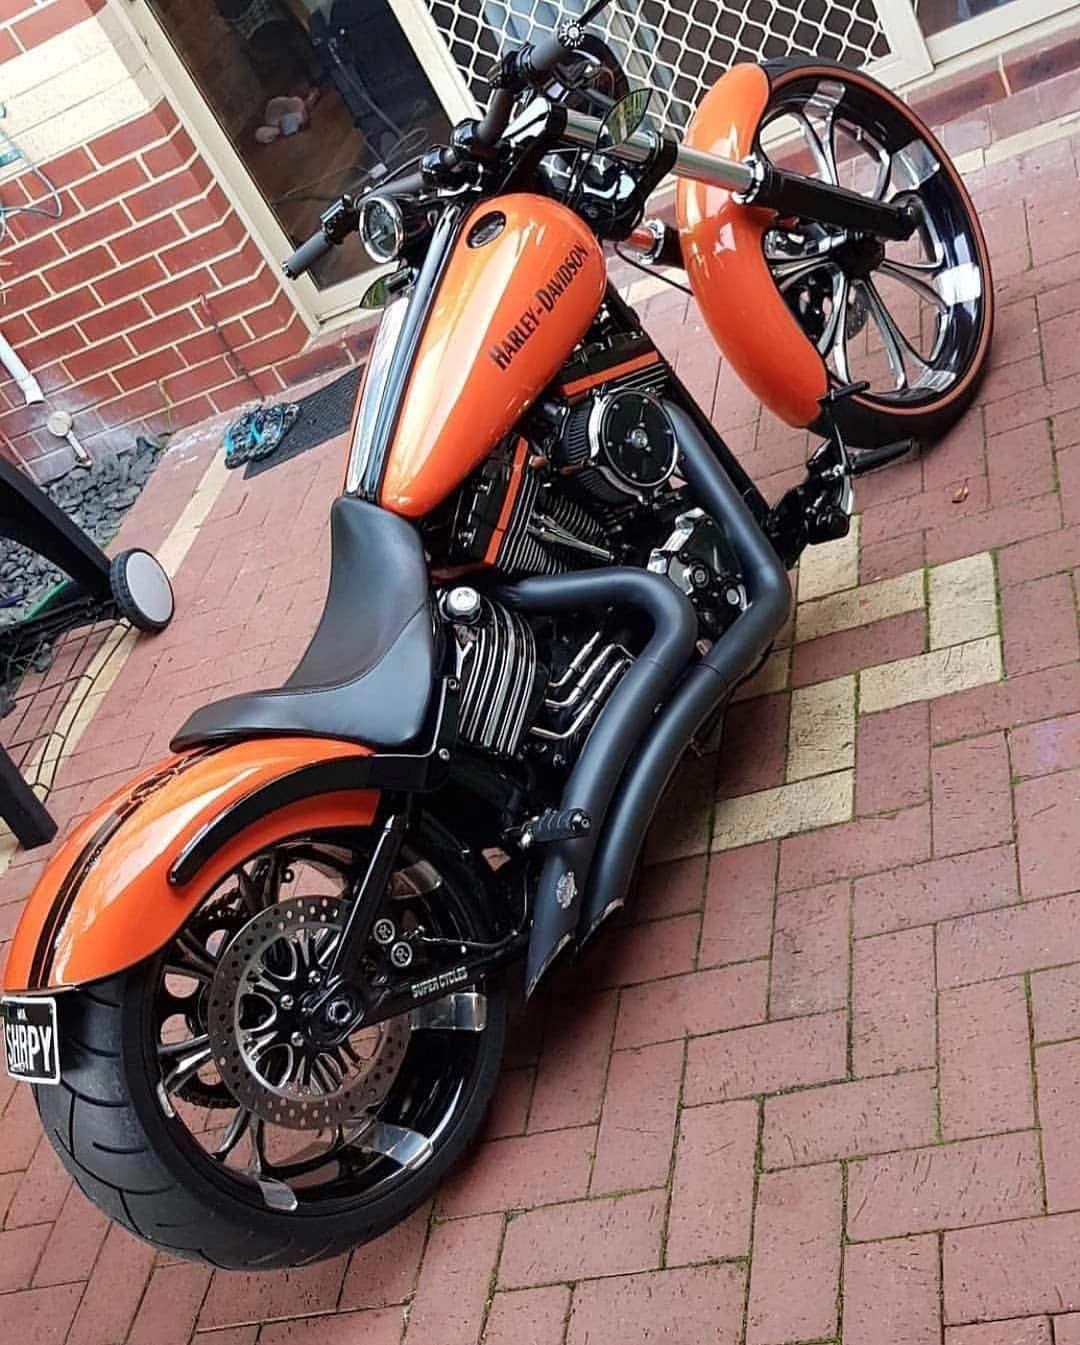 Harley Davidson Choppers Craigslist Harleydavidsonchoppers Harley Davidson Images Classic Harley Davidson Harley Davidson